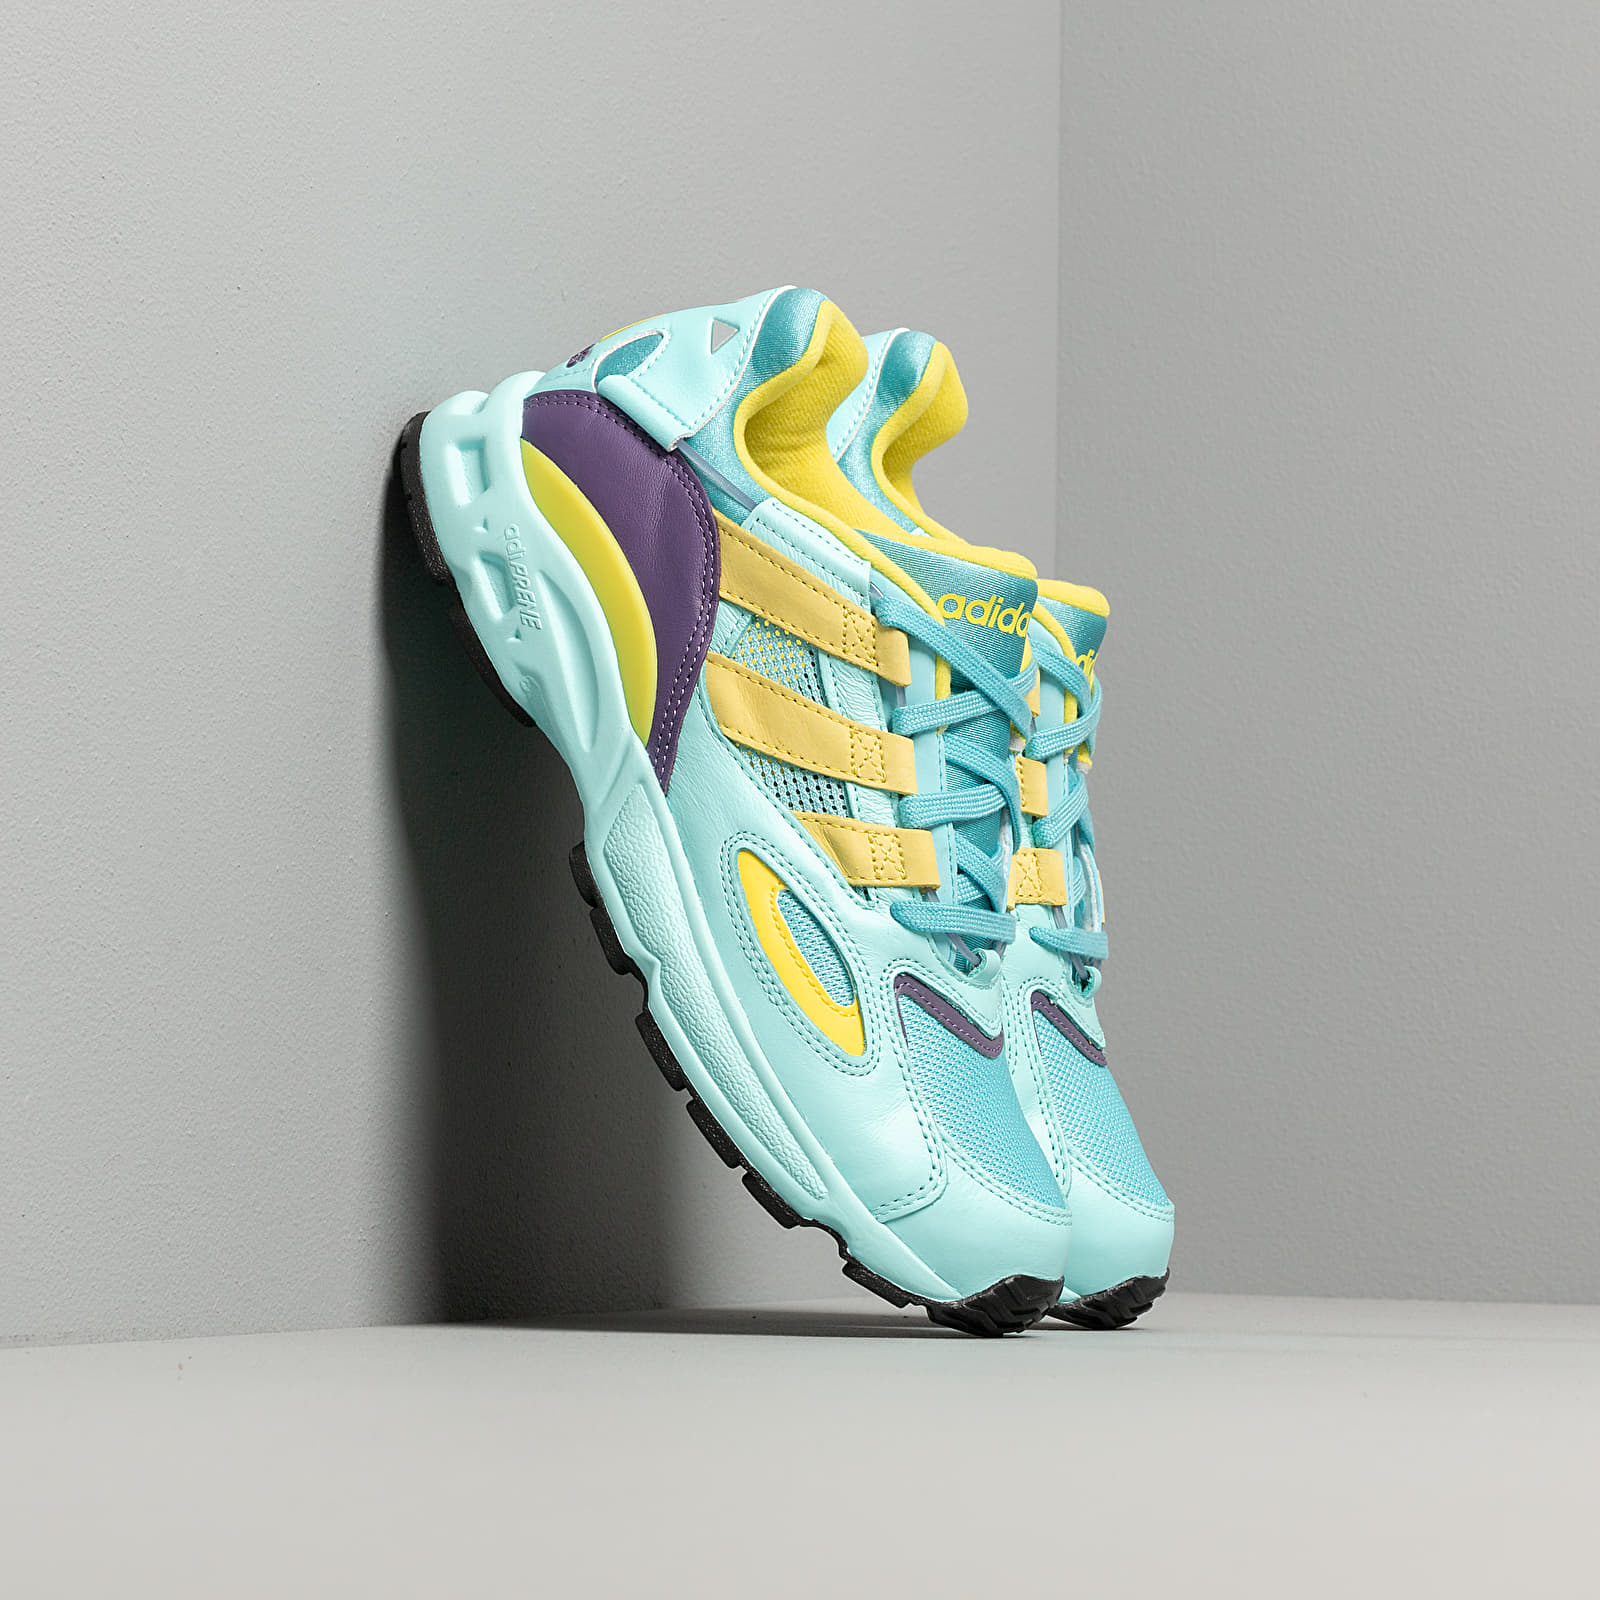 Chaussures et baskets homme adidas LXCON 94 Clear Aqua/ Light Aqua/ Shock Yellow